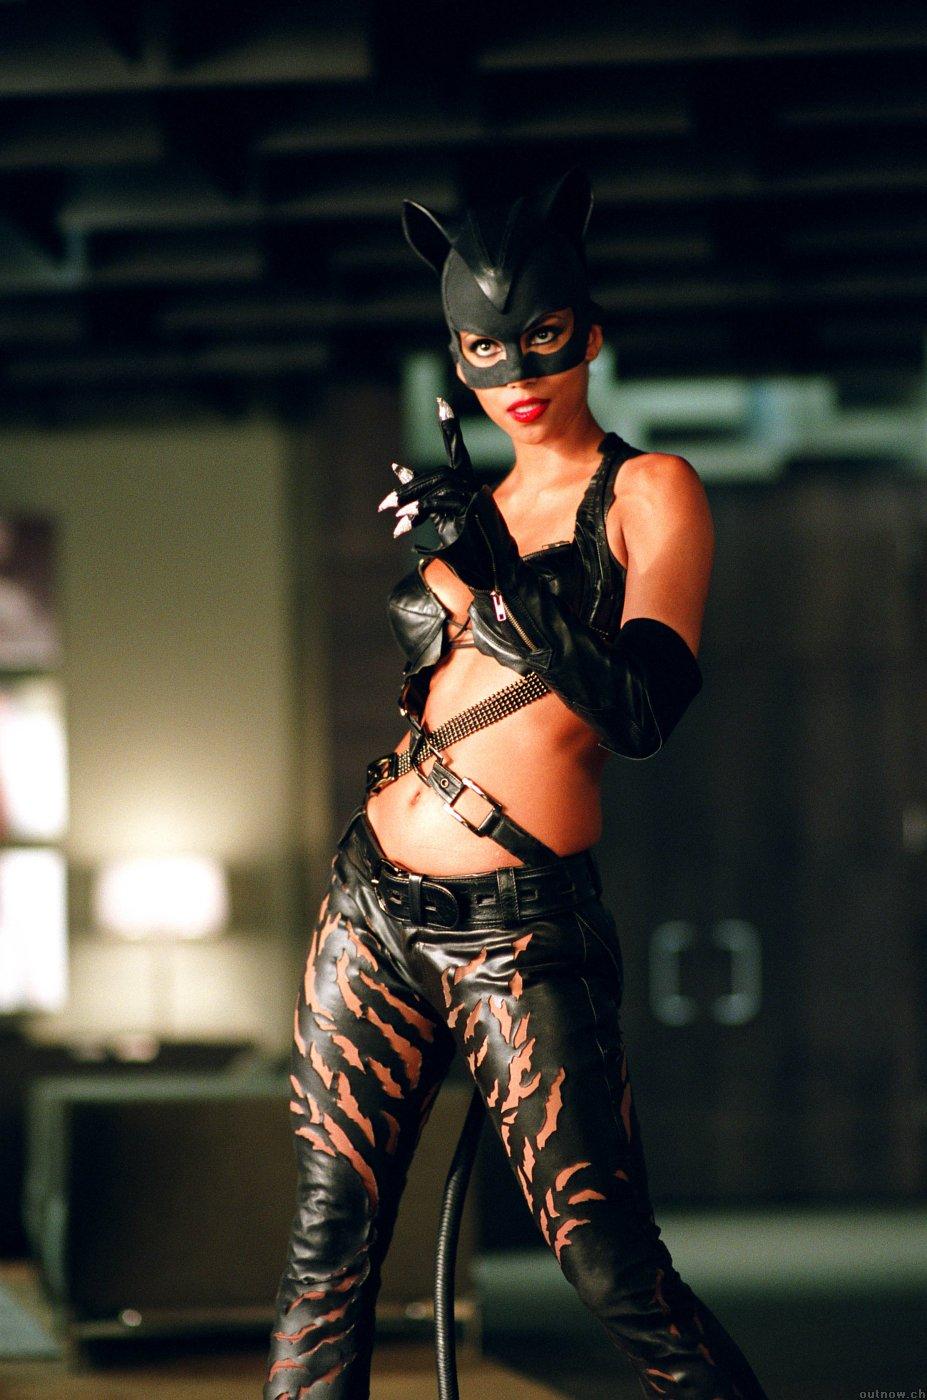 http://vignette1.wikia.nocookie.net/batman/images/5/5a/CatwomanHB.jpg/revision/latest?cb=20081025222506